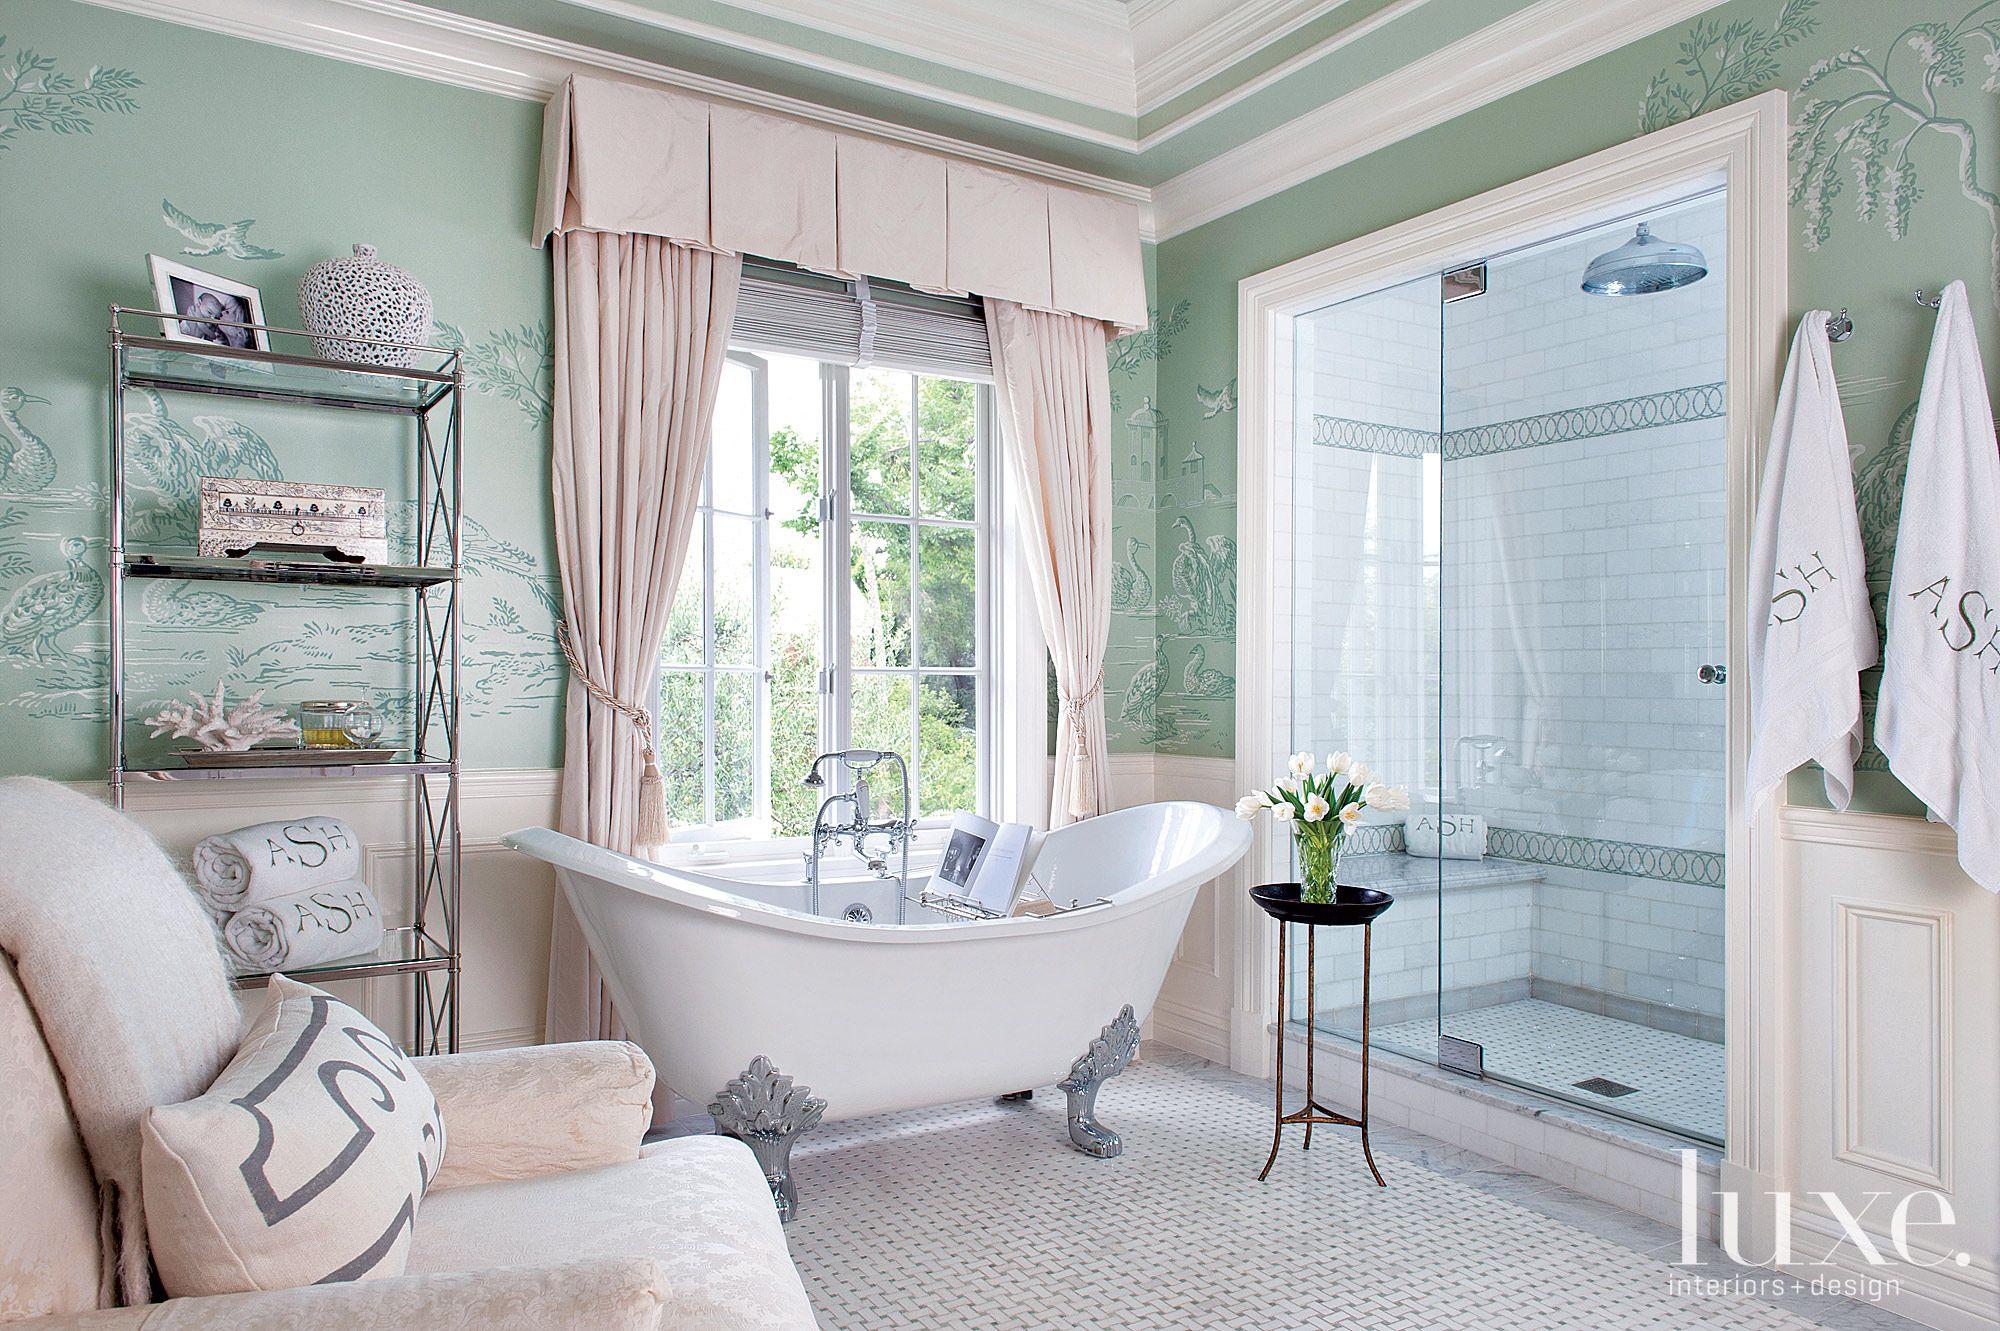 Traditional Green Bathroom with Clawfoot Tub